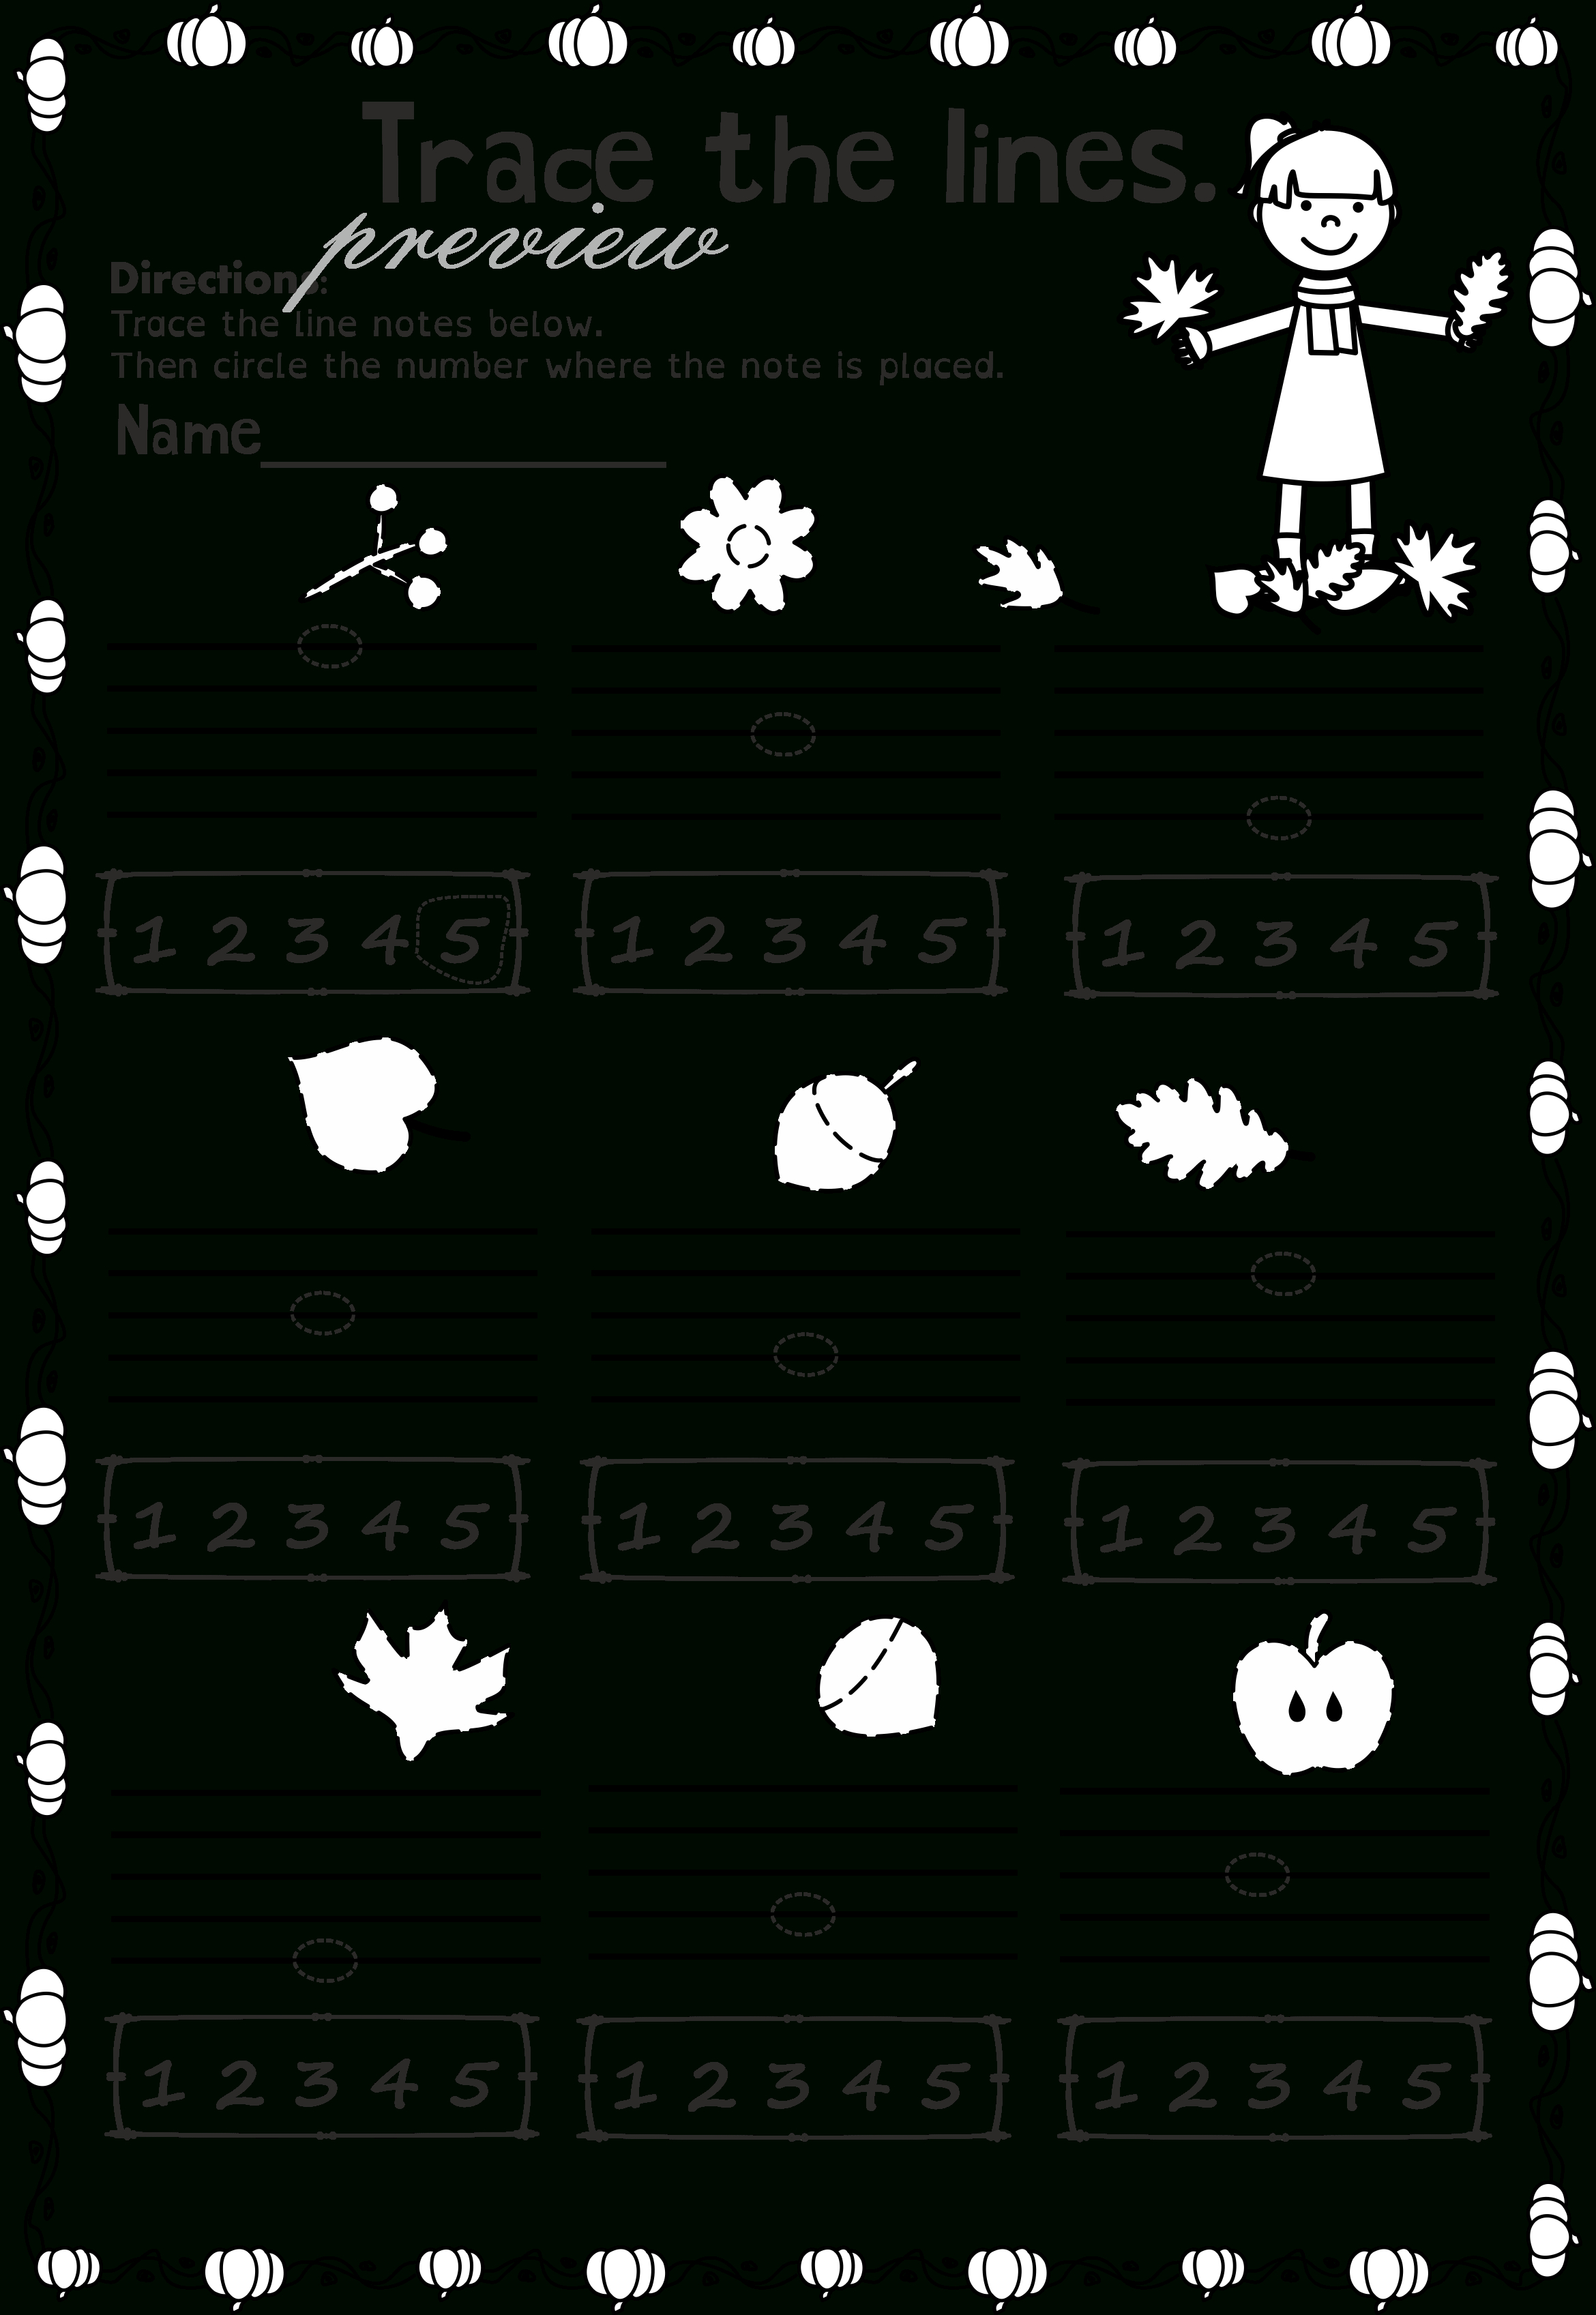 Worksheet : Piano Music Notes For Beginners And Worksheets Kids | Free Printable Preschool Music Worksheets